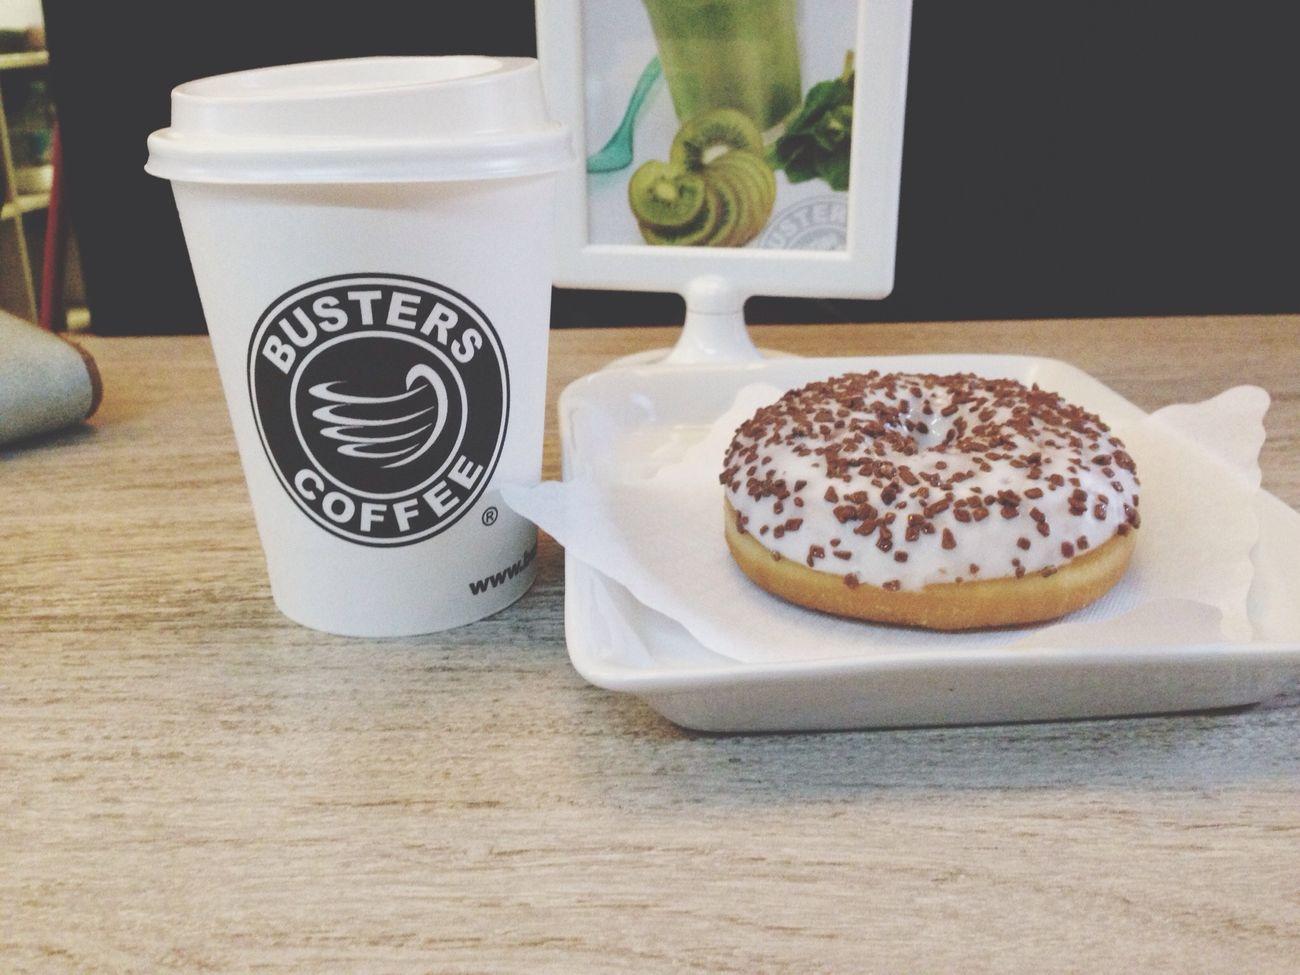 Buster Coffee Turin EyeEm Best Shots Ph: Me